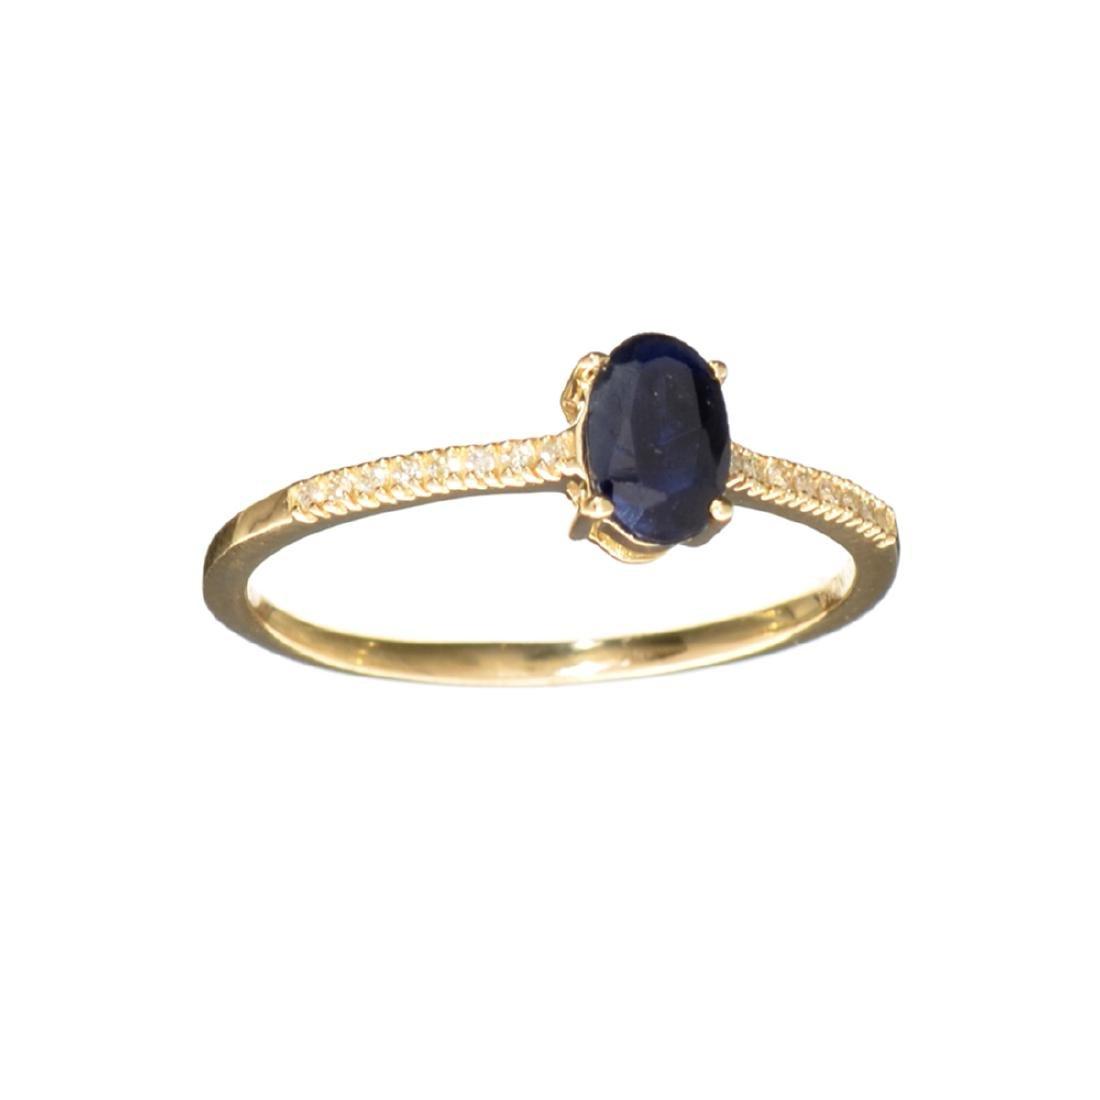 Designer Sebastian 14 KT Gold 0.61CT Oval Cut Sapphire